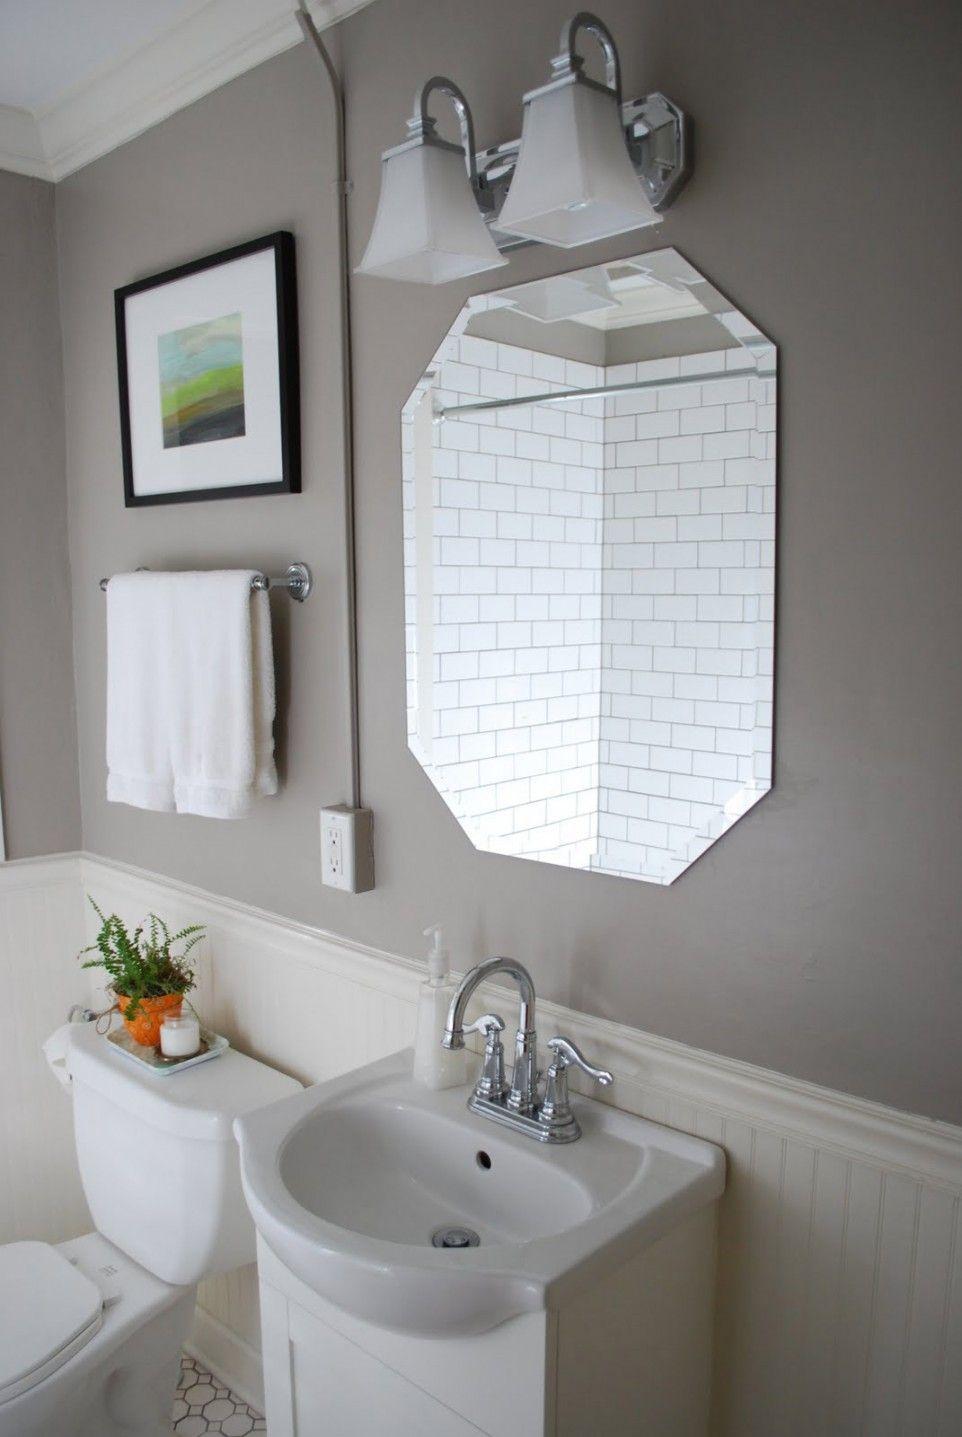 Beadboard Bathroom Protecting The Walls From Scratches Simple Beadboard Bathroom Image Beadboard Bathroom Painting Bathroom